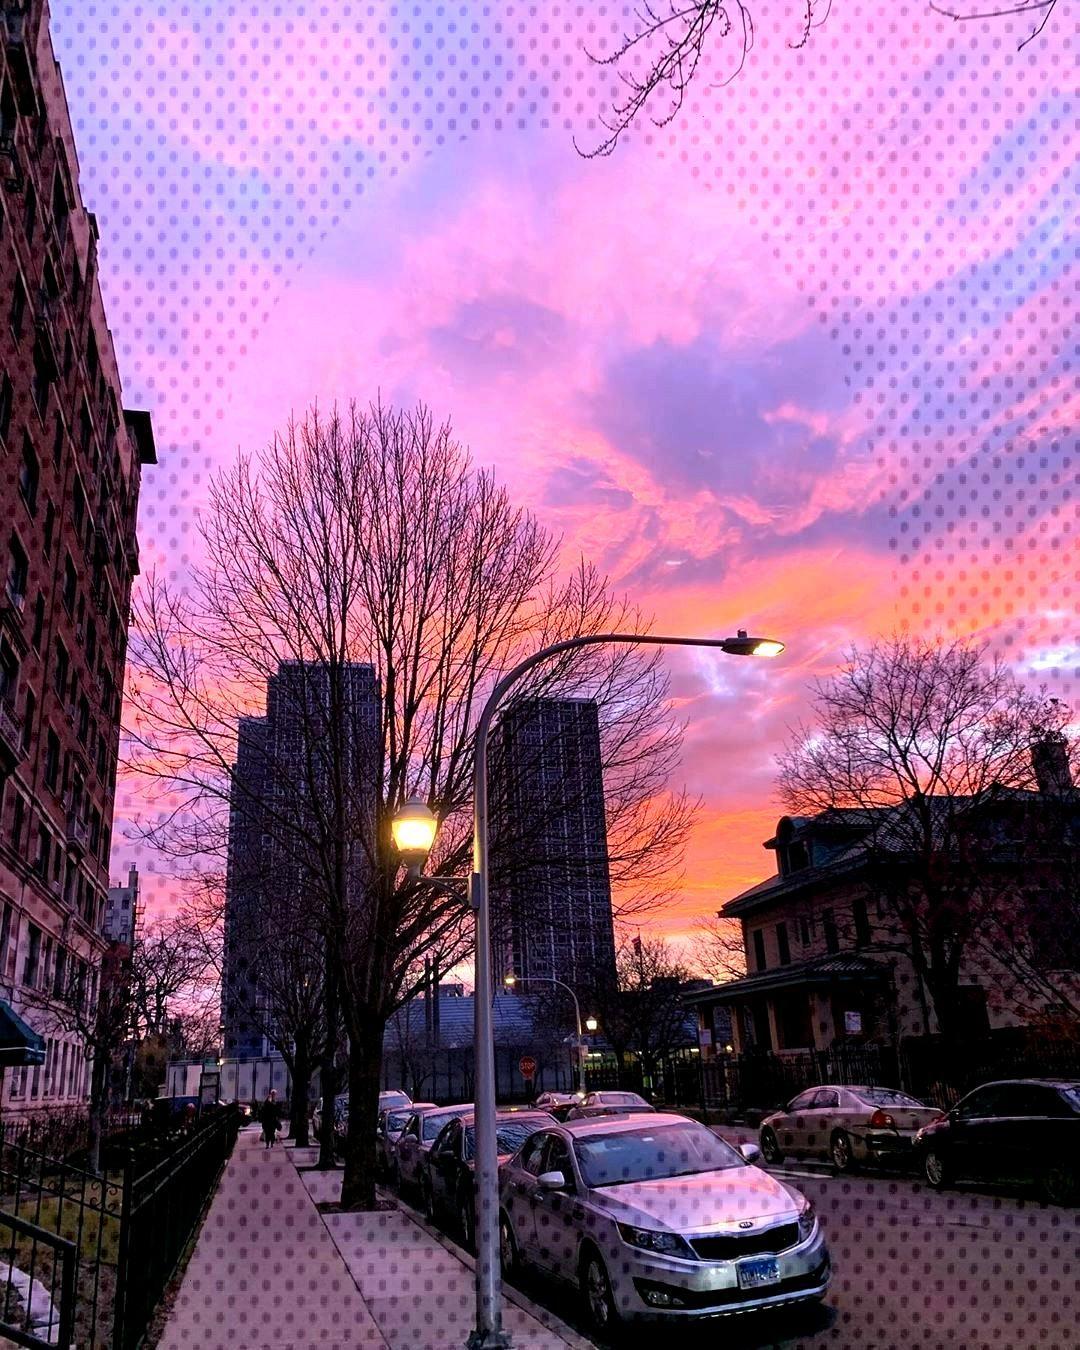 Red sky at morning, sailors take warning • •